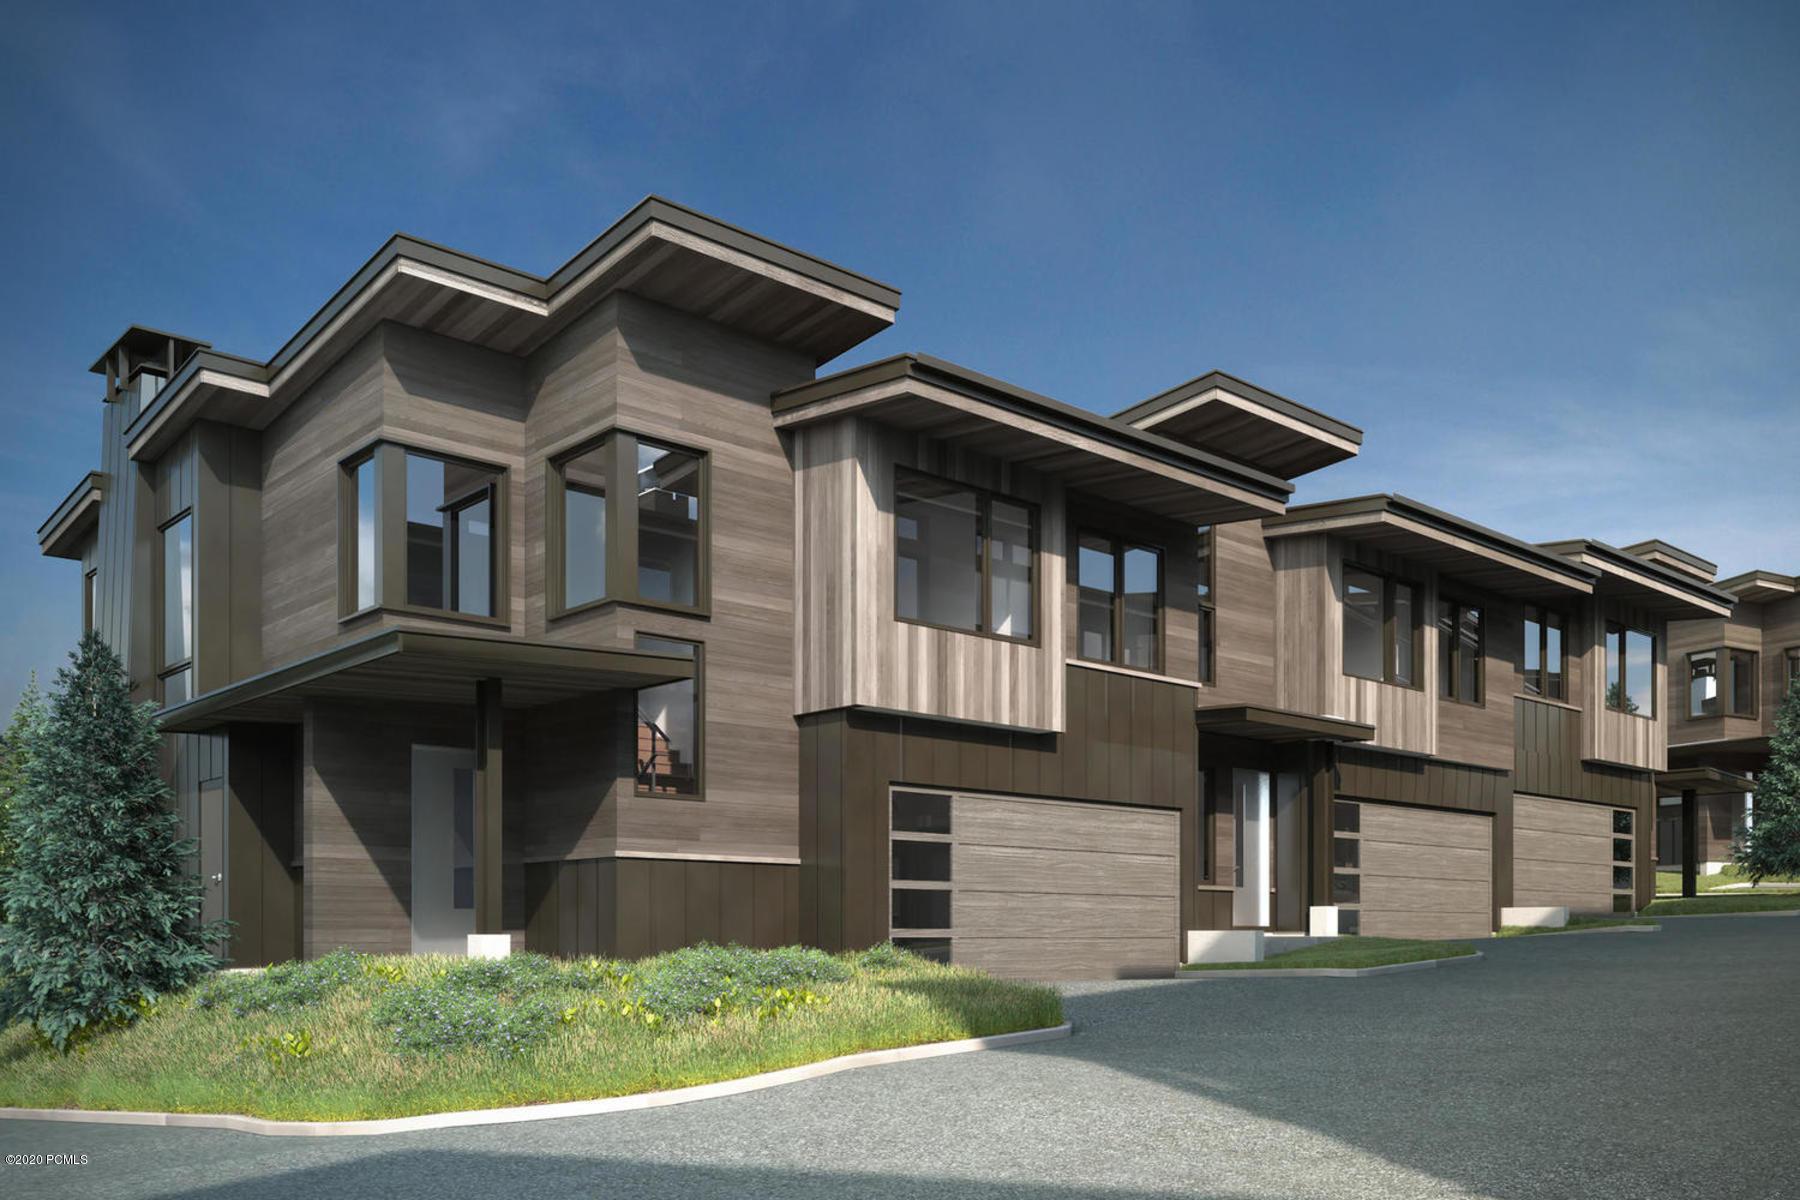 3542 Ridgeline Drive, Park City, Utah 84098, 5 Bedrooms Bedrooms, ,6 BathroomsBathrooms,Condominium,For Sale,Ridgeline,20190109112430415765000000